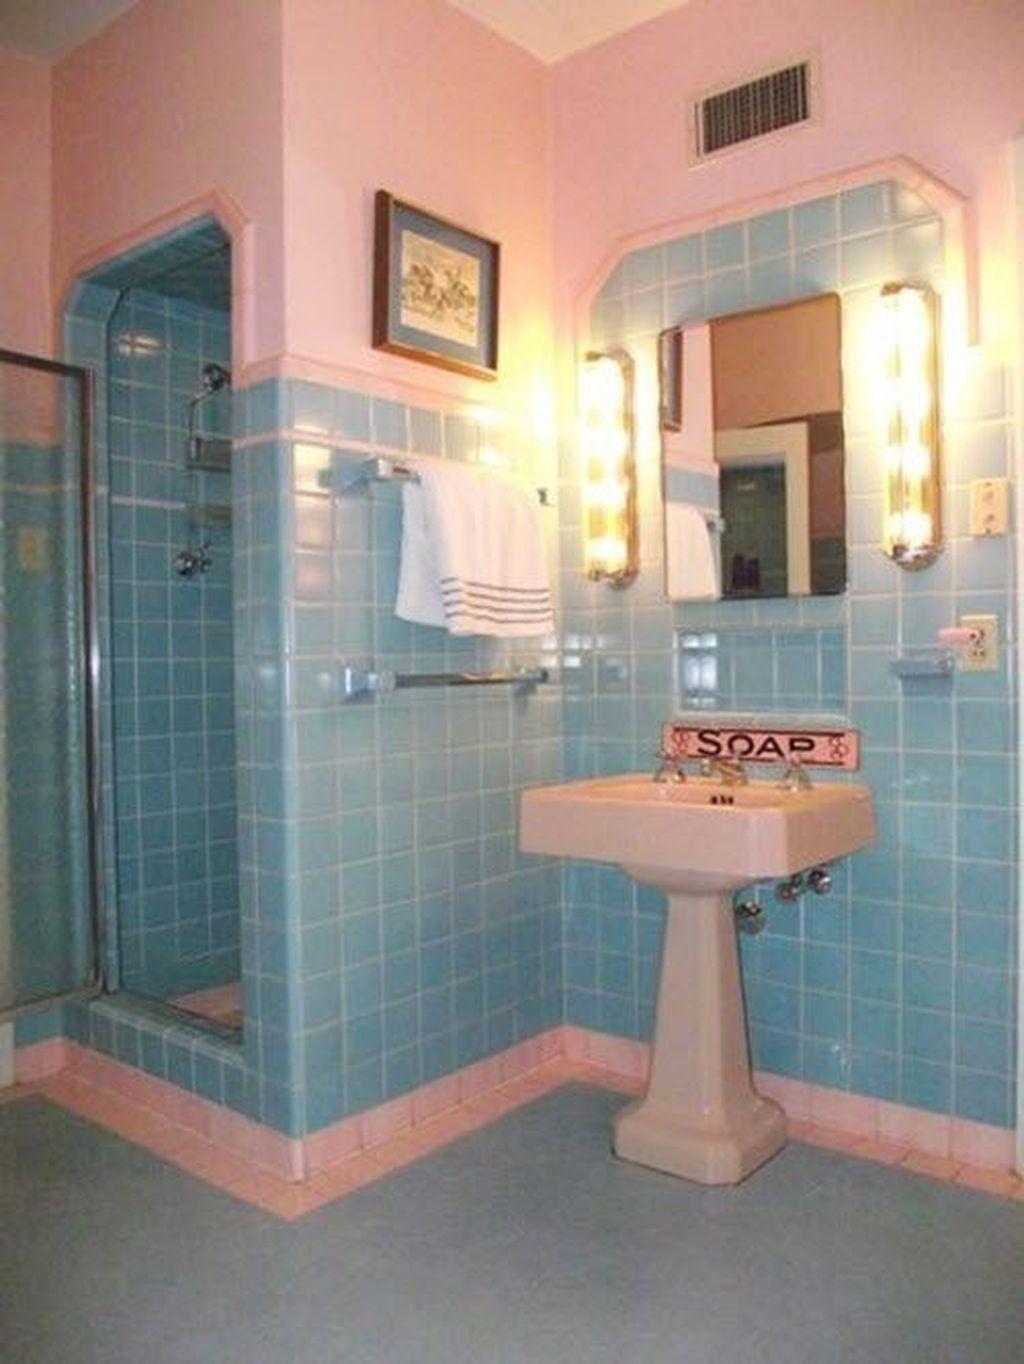 20 Impressive Vintage Bathroom Decoration You Ll Love In 2020 Blue Bathroom Tile Vintage Bathrooms Vintage Bathroom